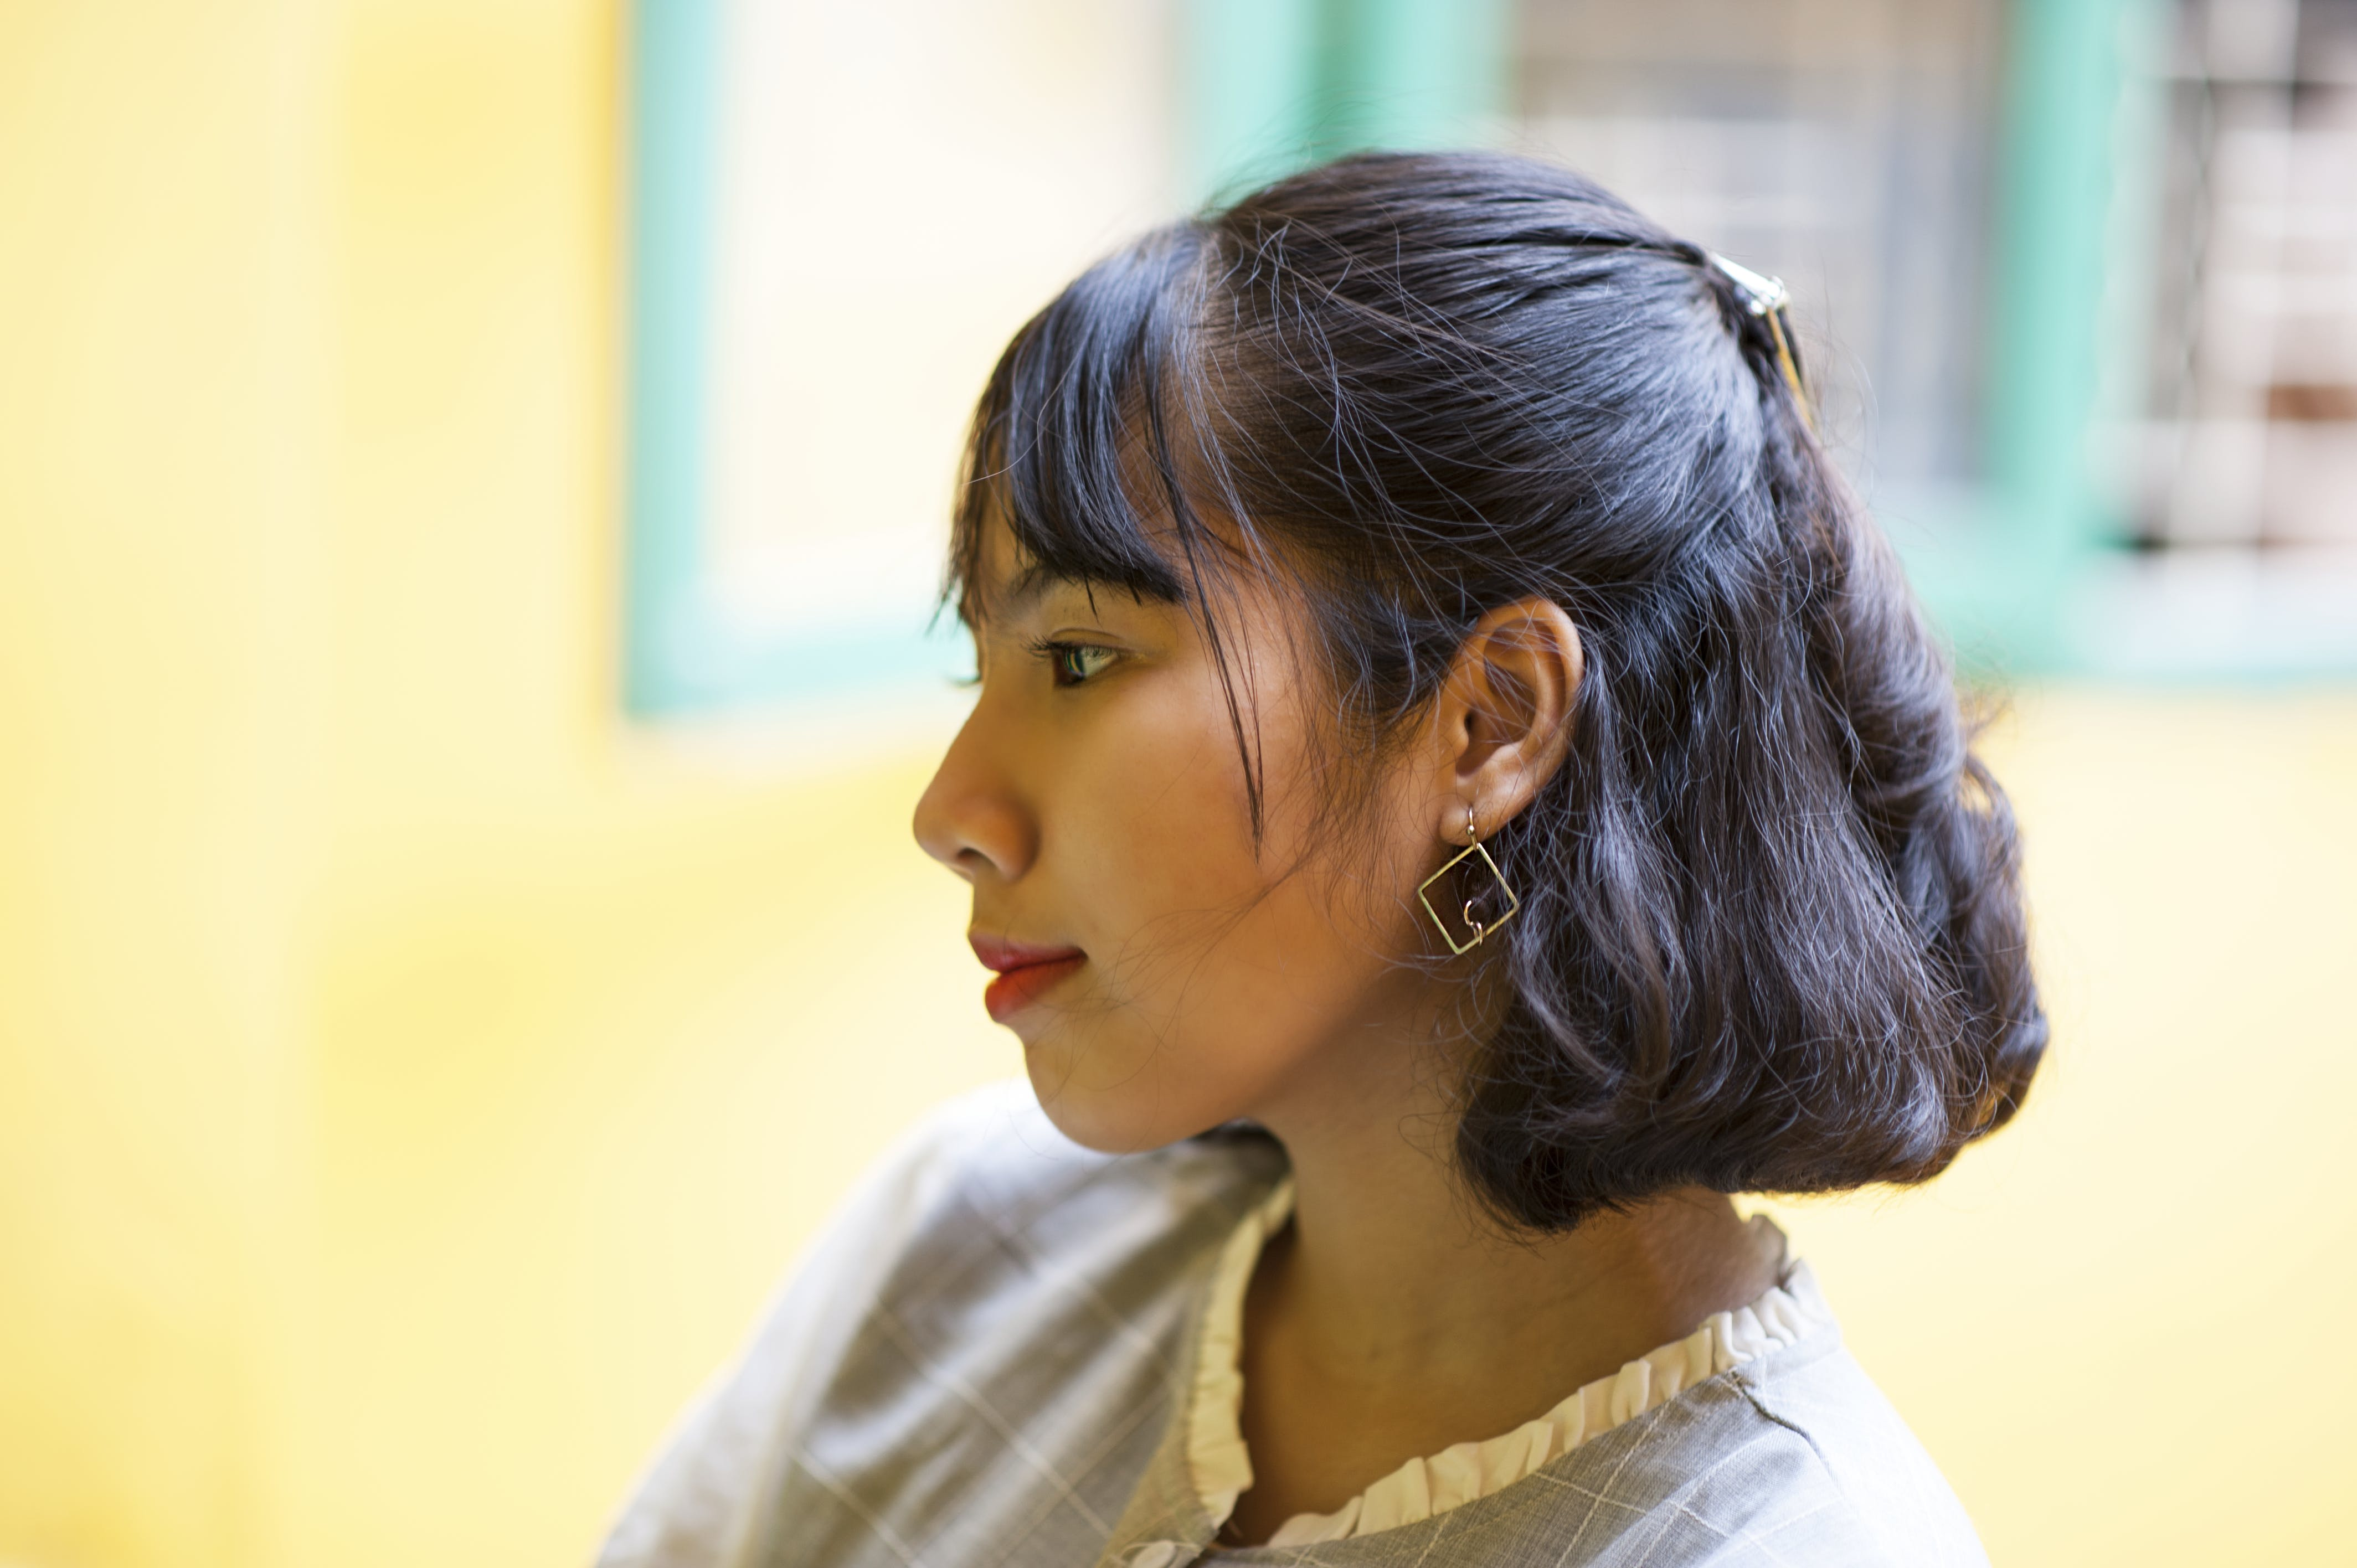 Gratis arkivbilde med ansiktsuttrykk, asiatisk jente, asiatisk person, attraktiv